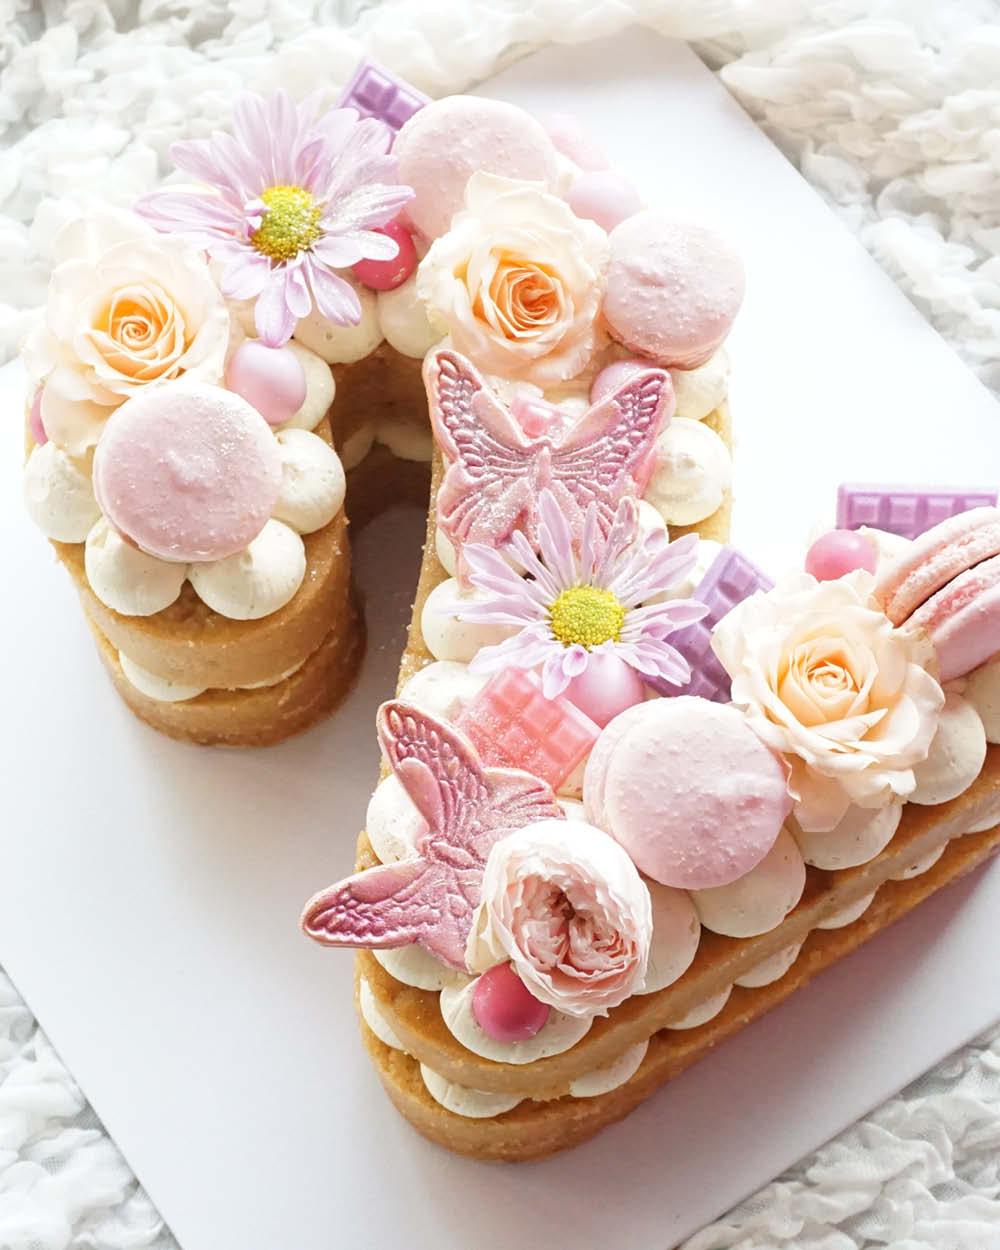 Cakes_By_Aranee_Perth_Drip_Cakes_Custom_Cakes_Wedding_Cakes_Macarons_Cupcakes_Personalised_Cookies_CAKES_Gallery3.jpg